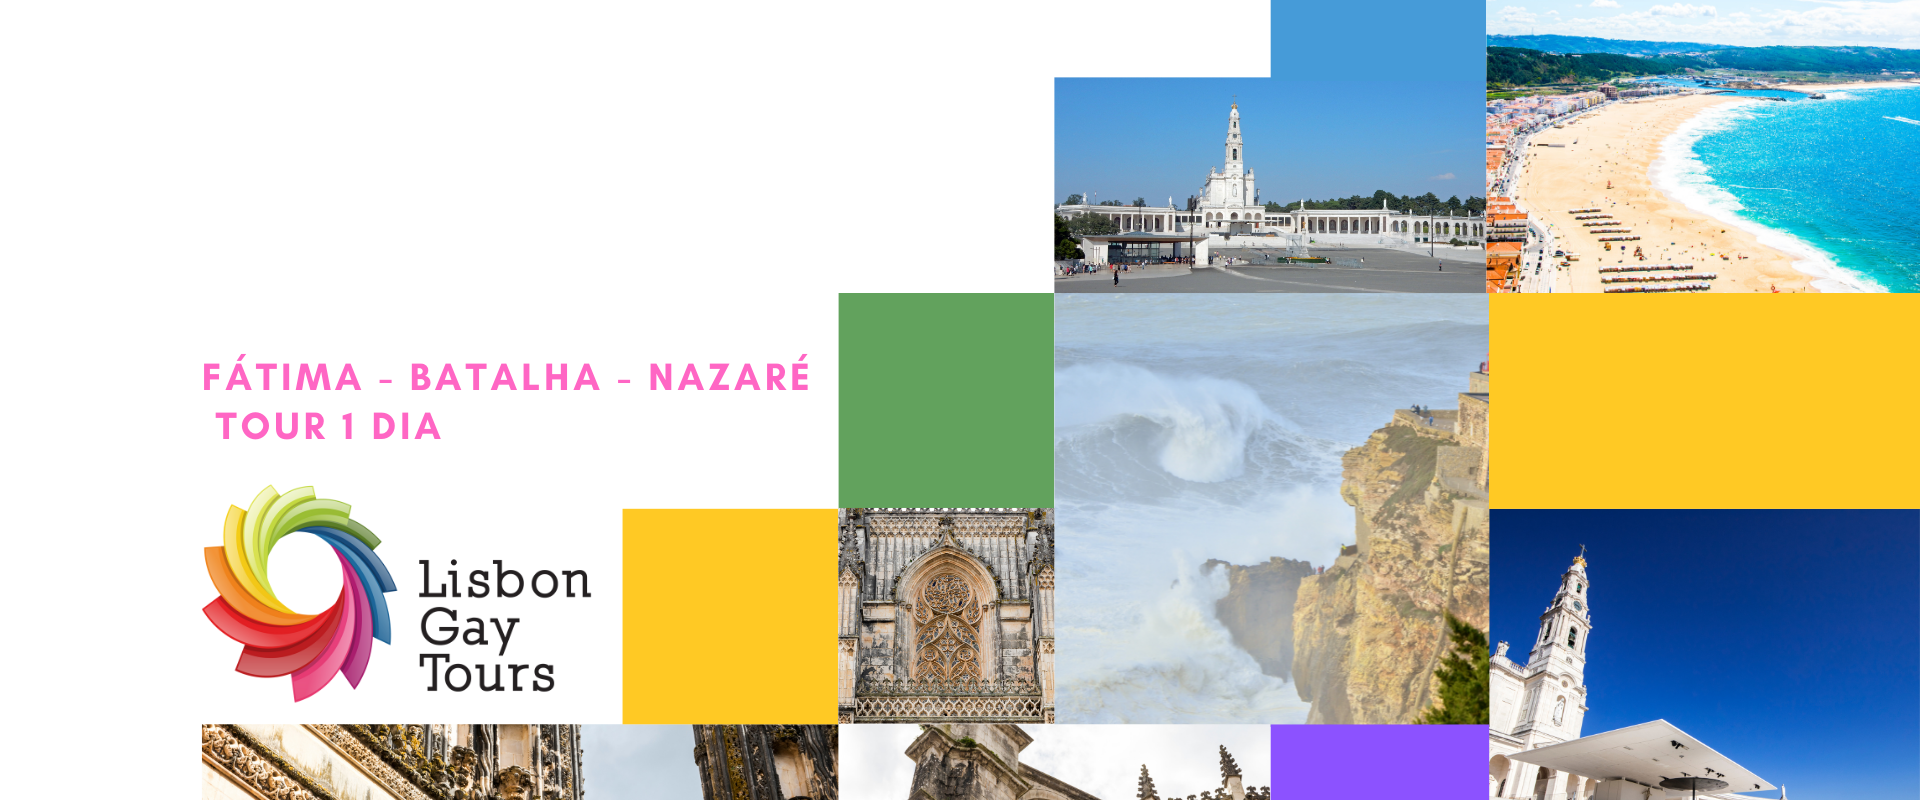 Fátima – Batalha – Nazaré Tour 1 Dia